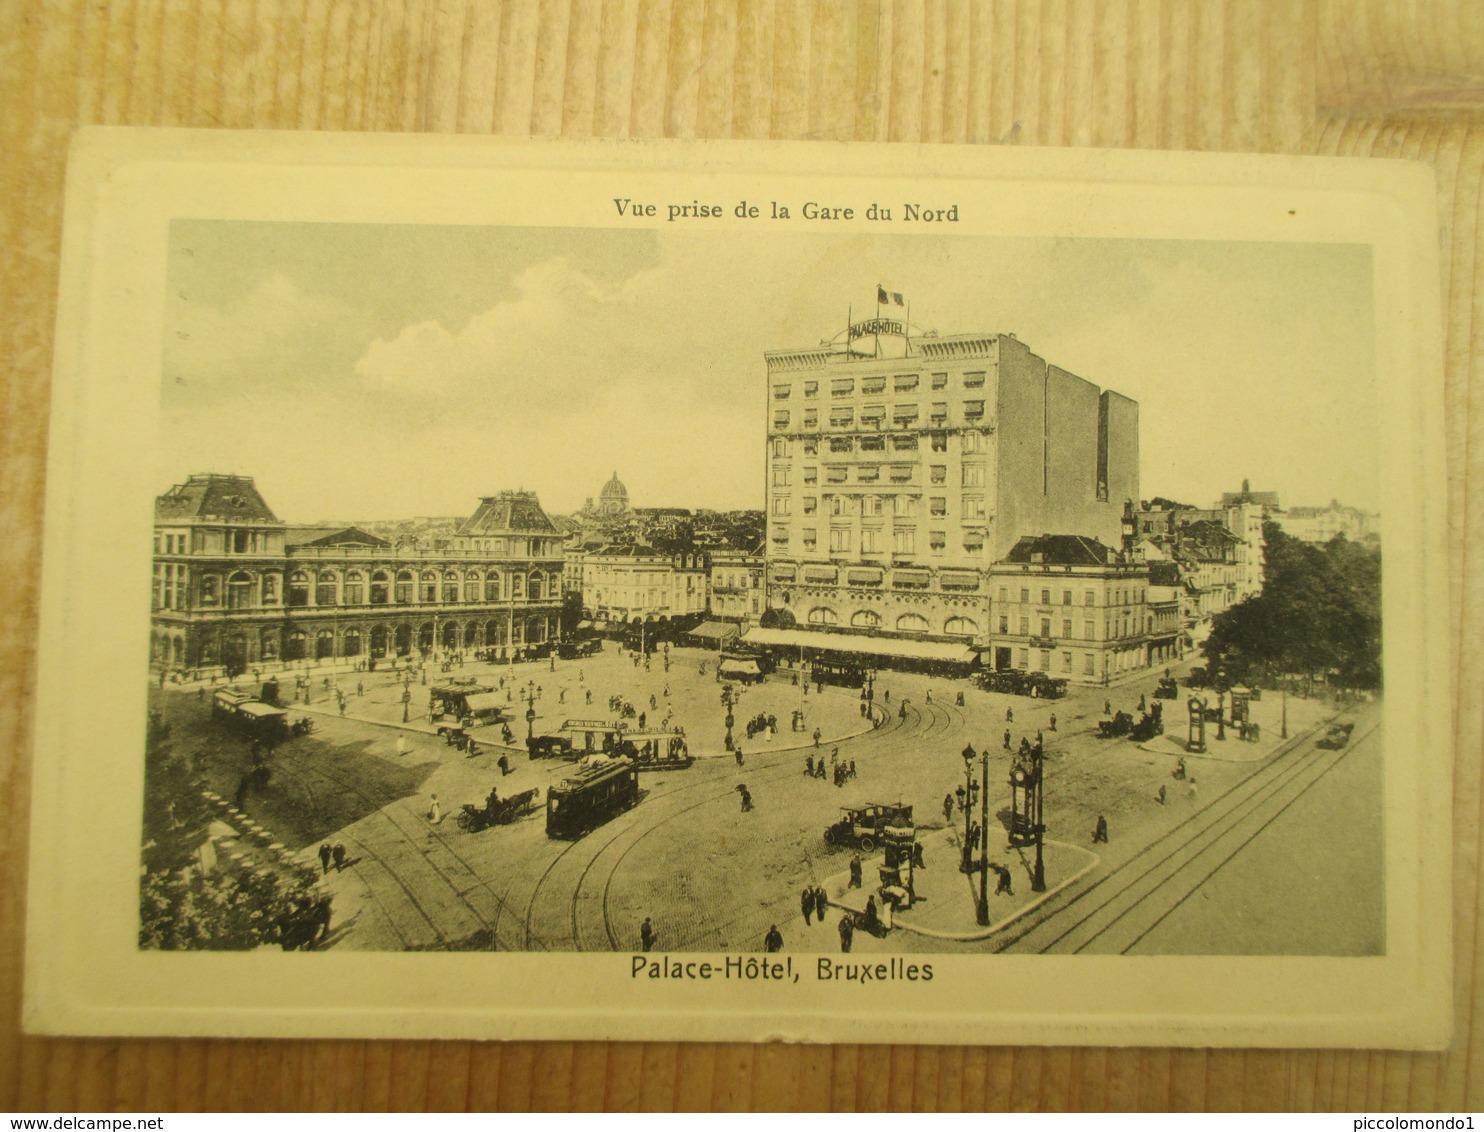 Bruxelles La Gare Du Nord Palace Hotel 1913 - Spoorwegen, Stations